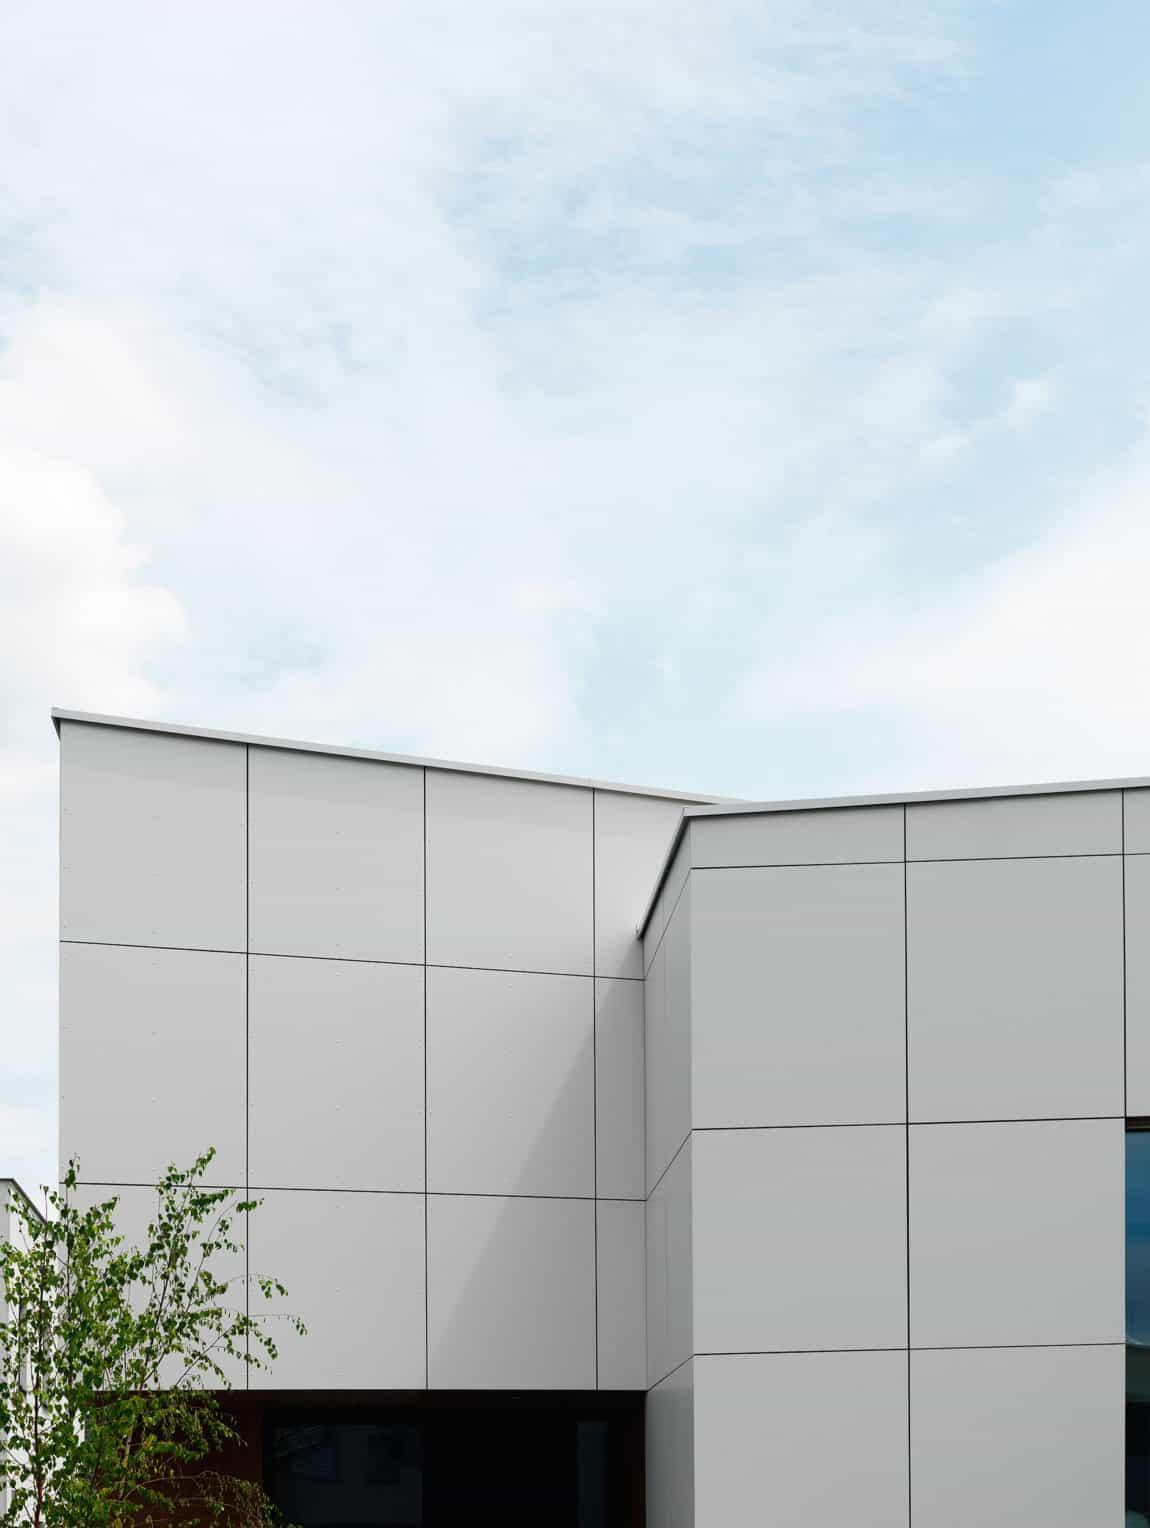 Musterhaus Vienna by SoNo arhitekti (3)